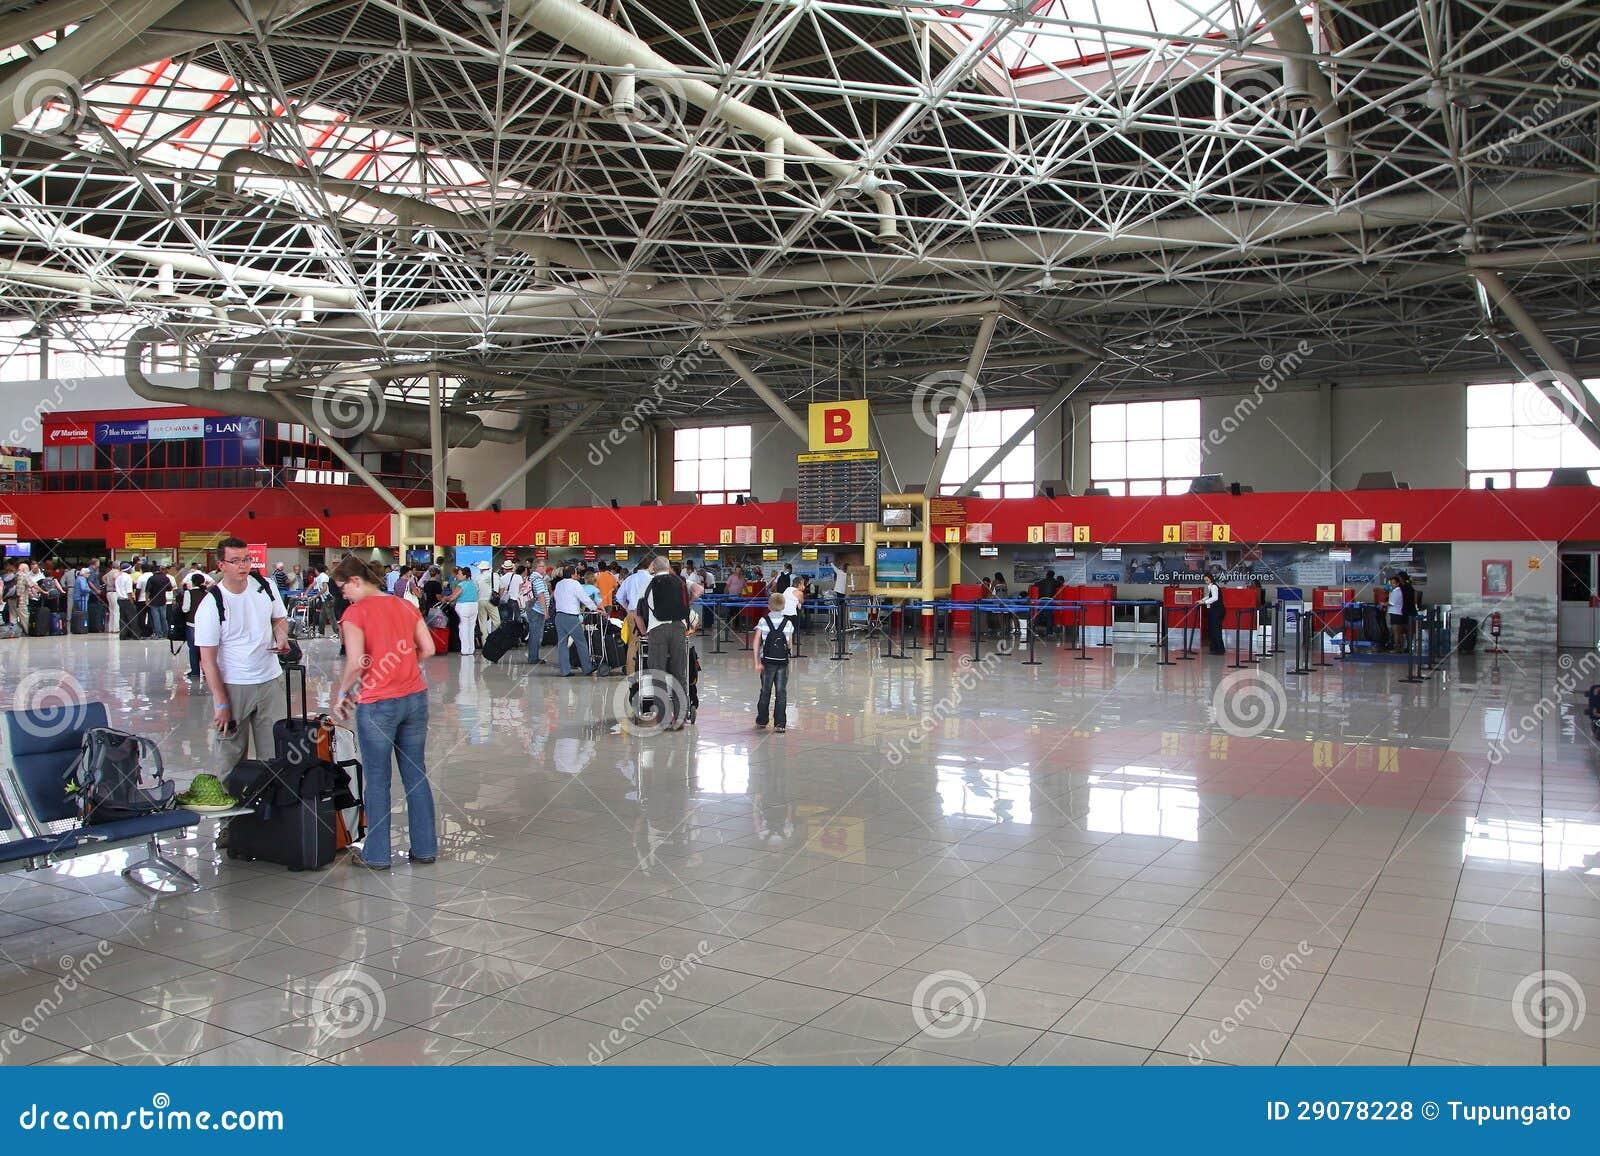 Aeroporto Havana Arrivi : Havana airport cuba stock photos download images